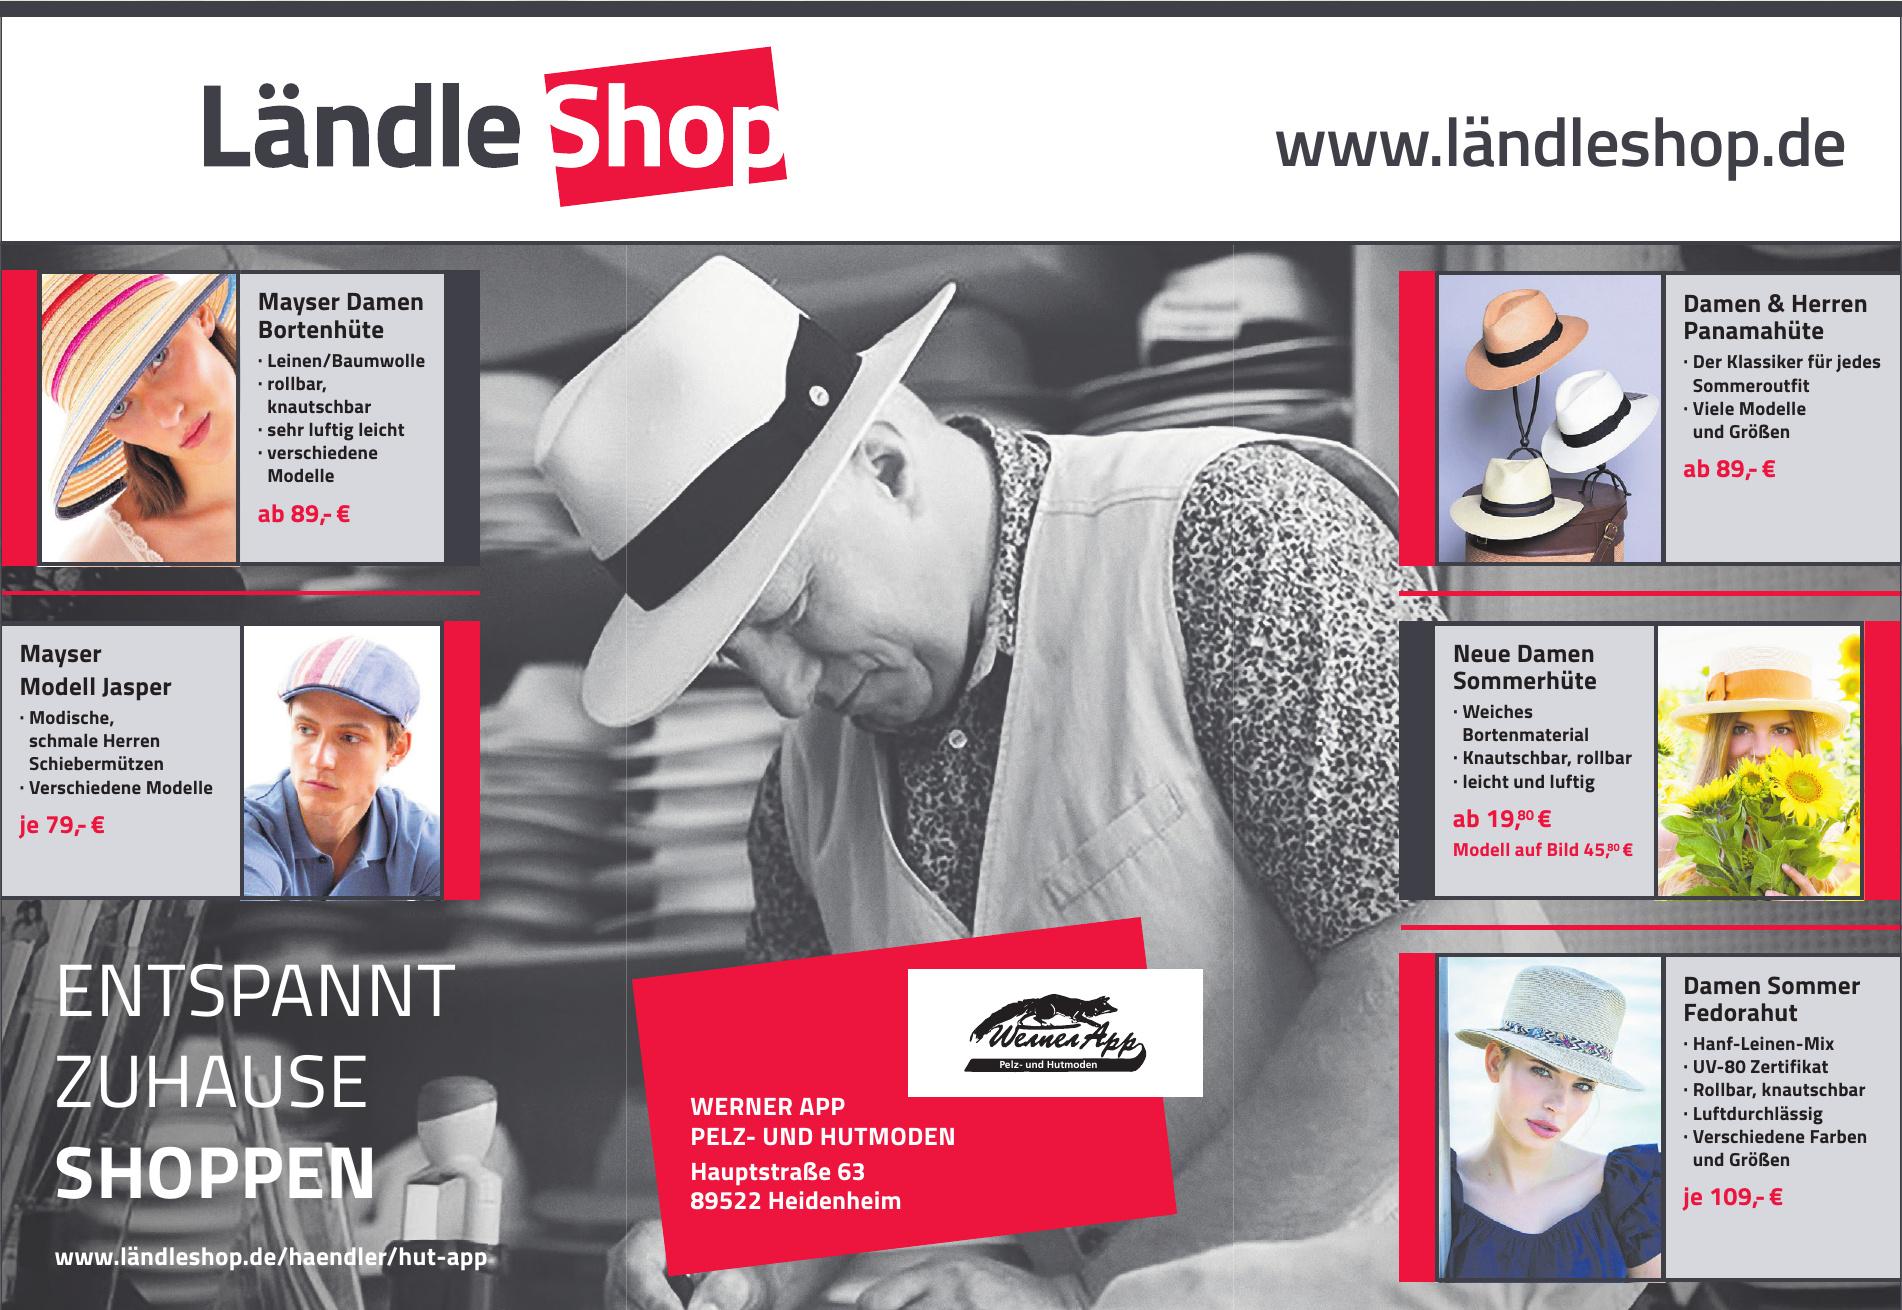 Ländle Shop